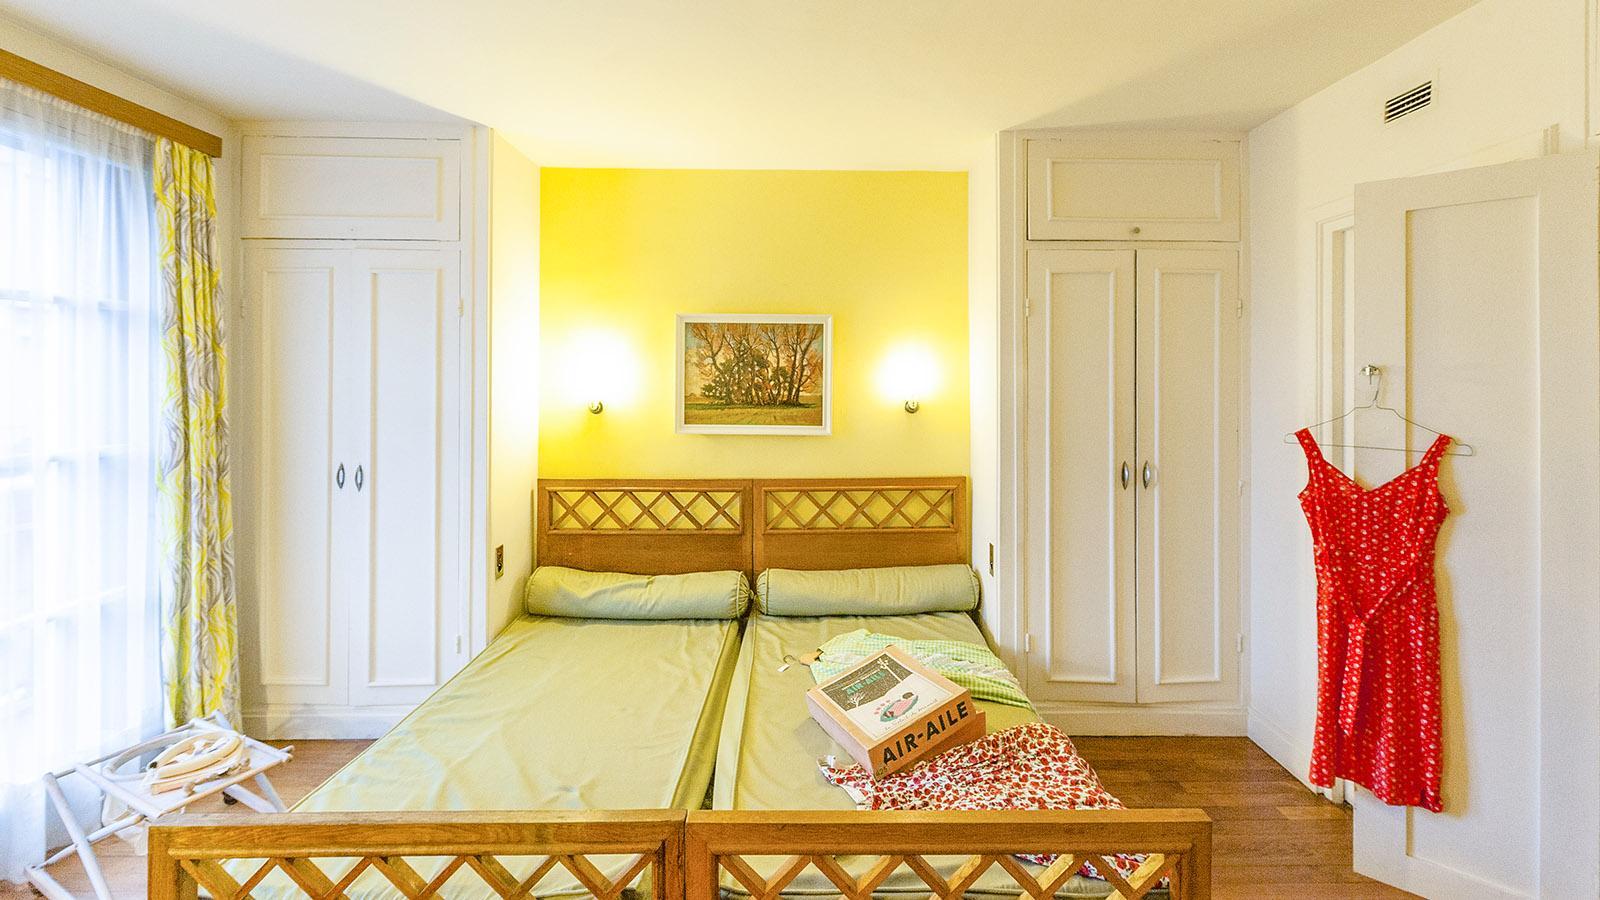 Appartement Témoin: das Schlafzimmer. Foto: Hilke Maunder